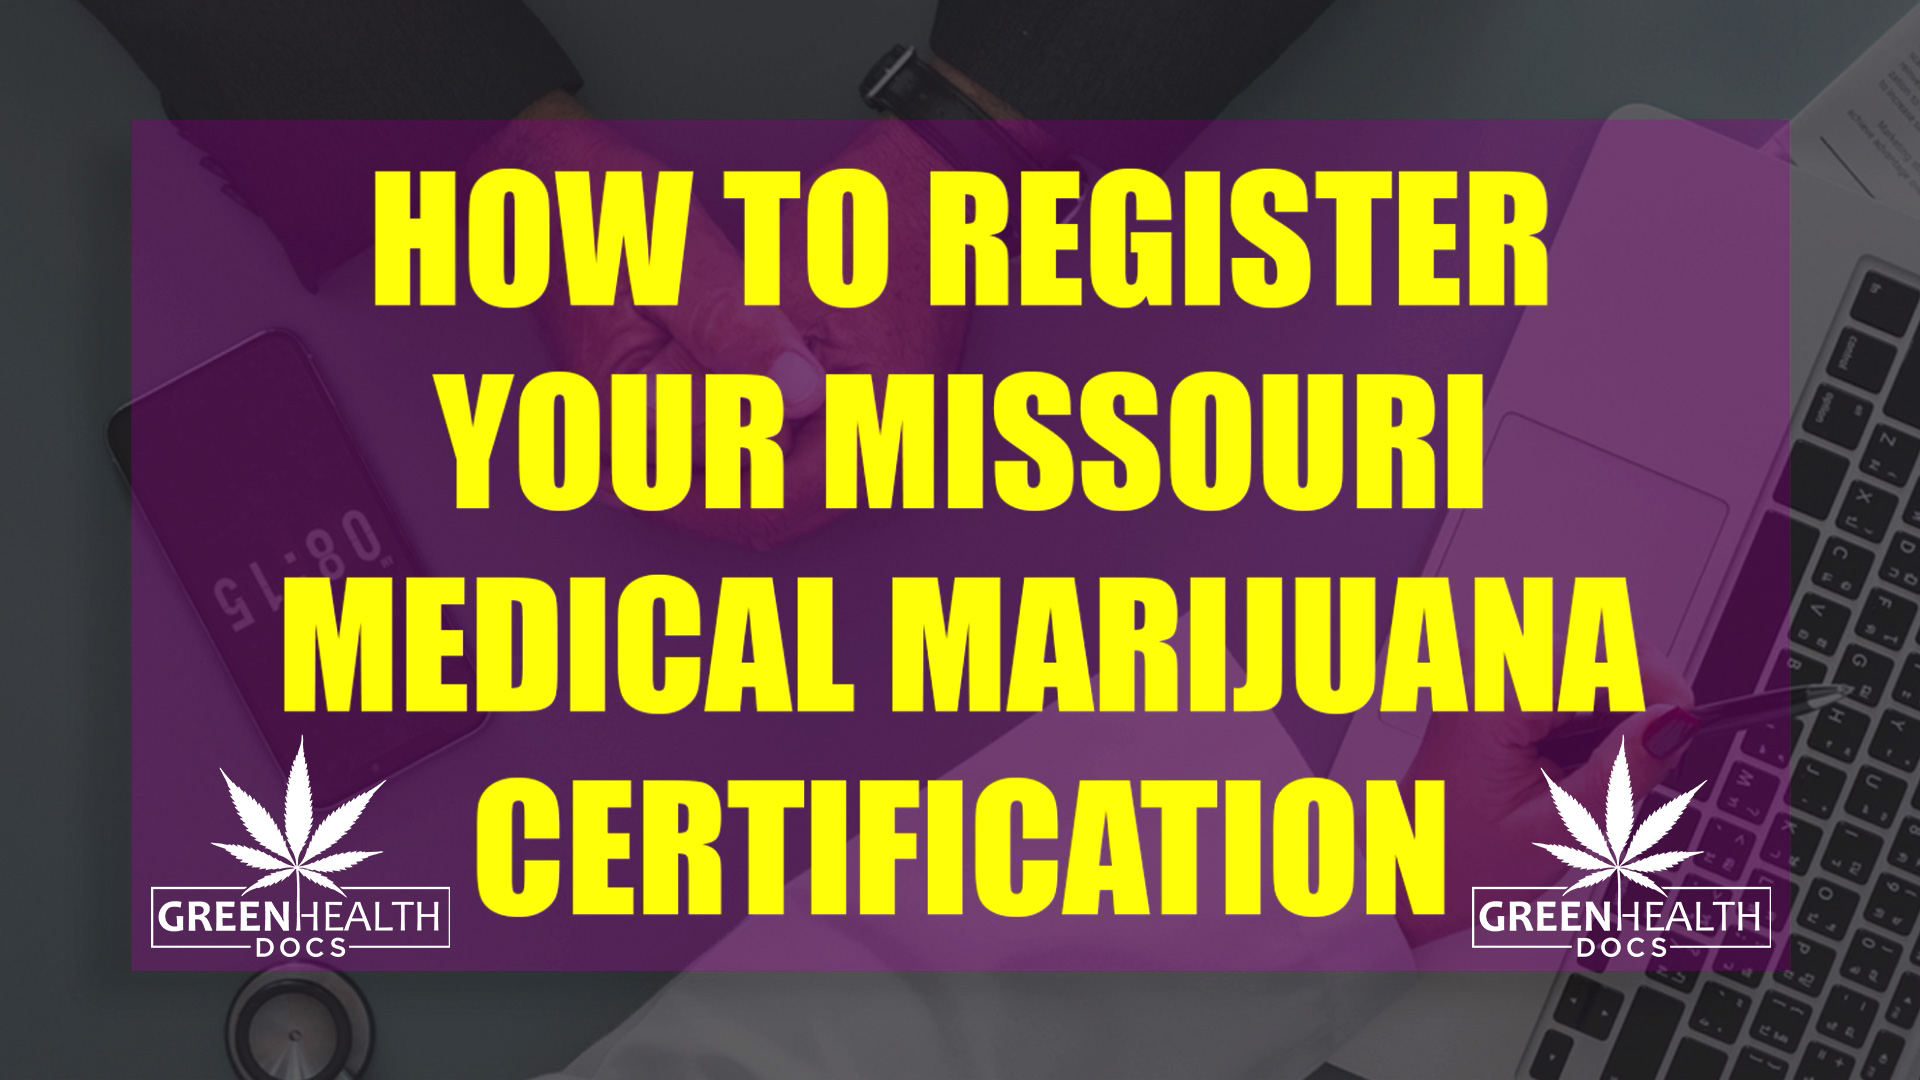 Medical Marijuana Certification